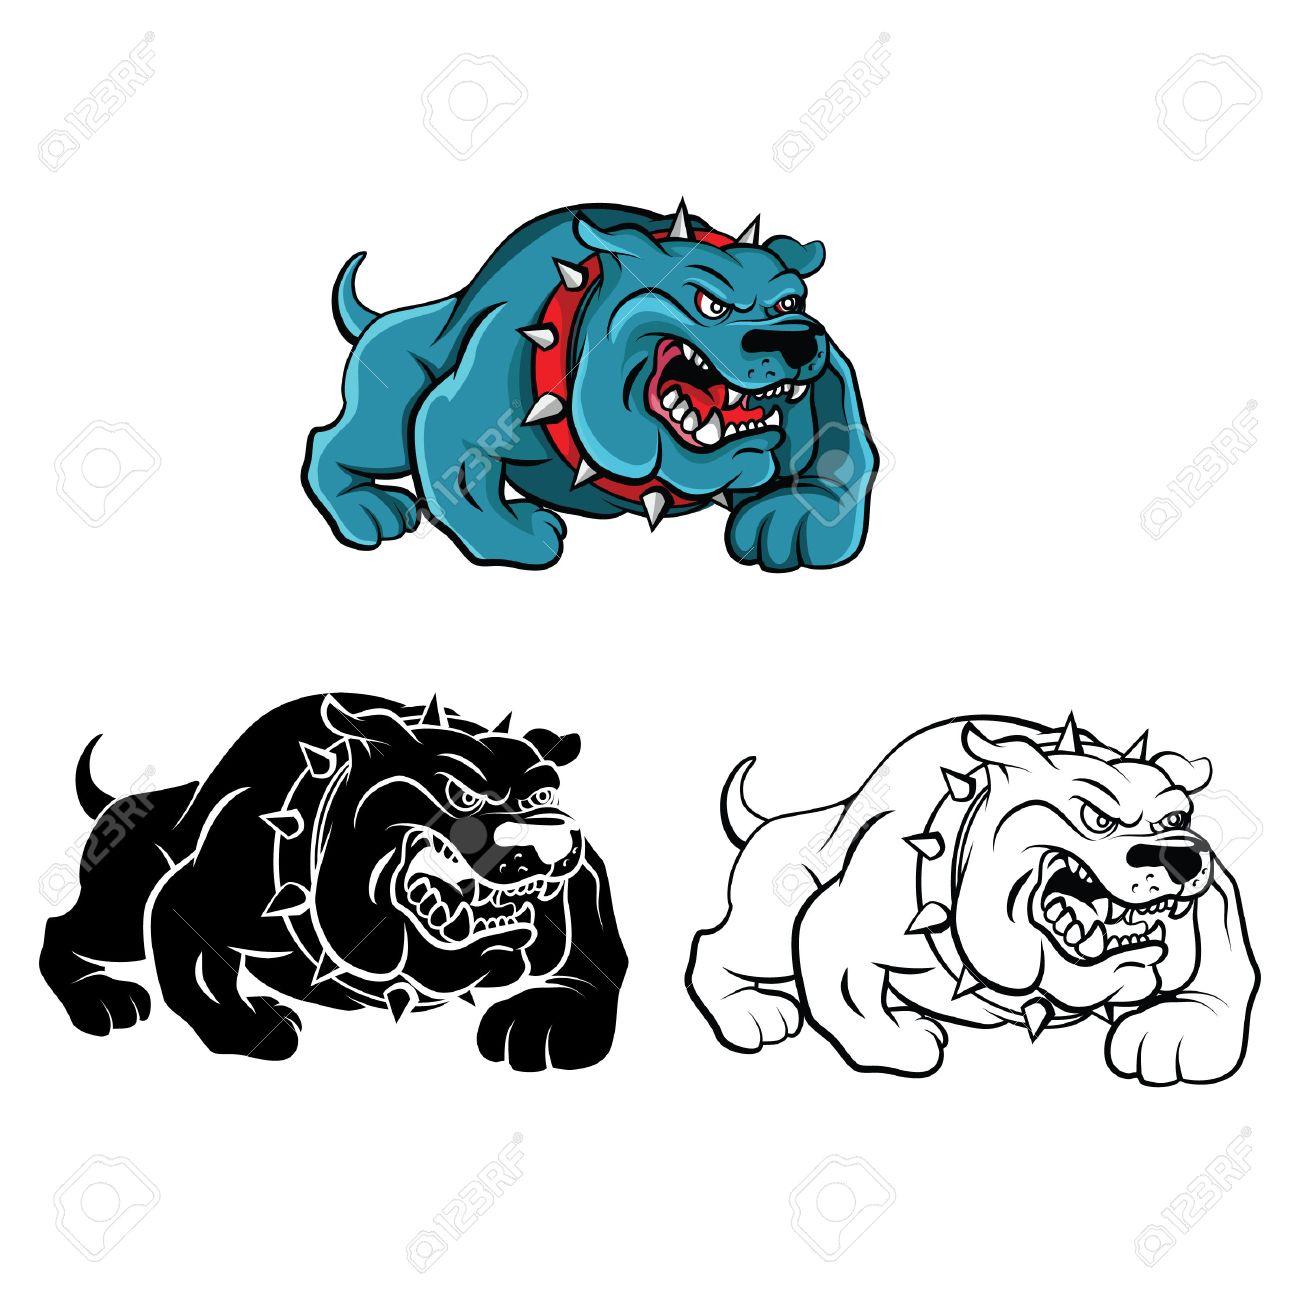 Encantador Dibujos De Perros Pitbull Para Colorear